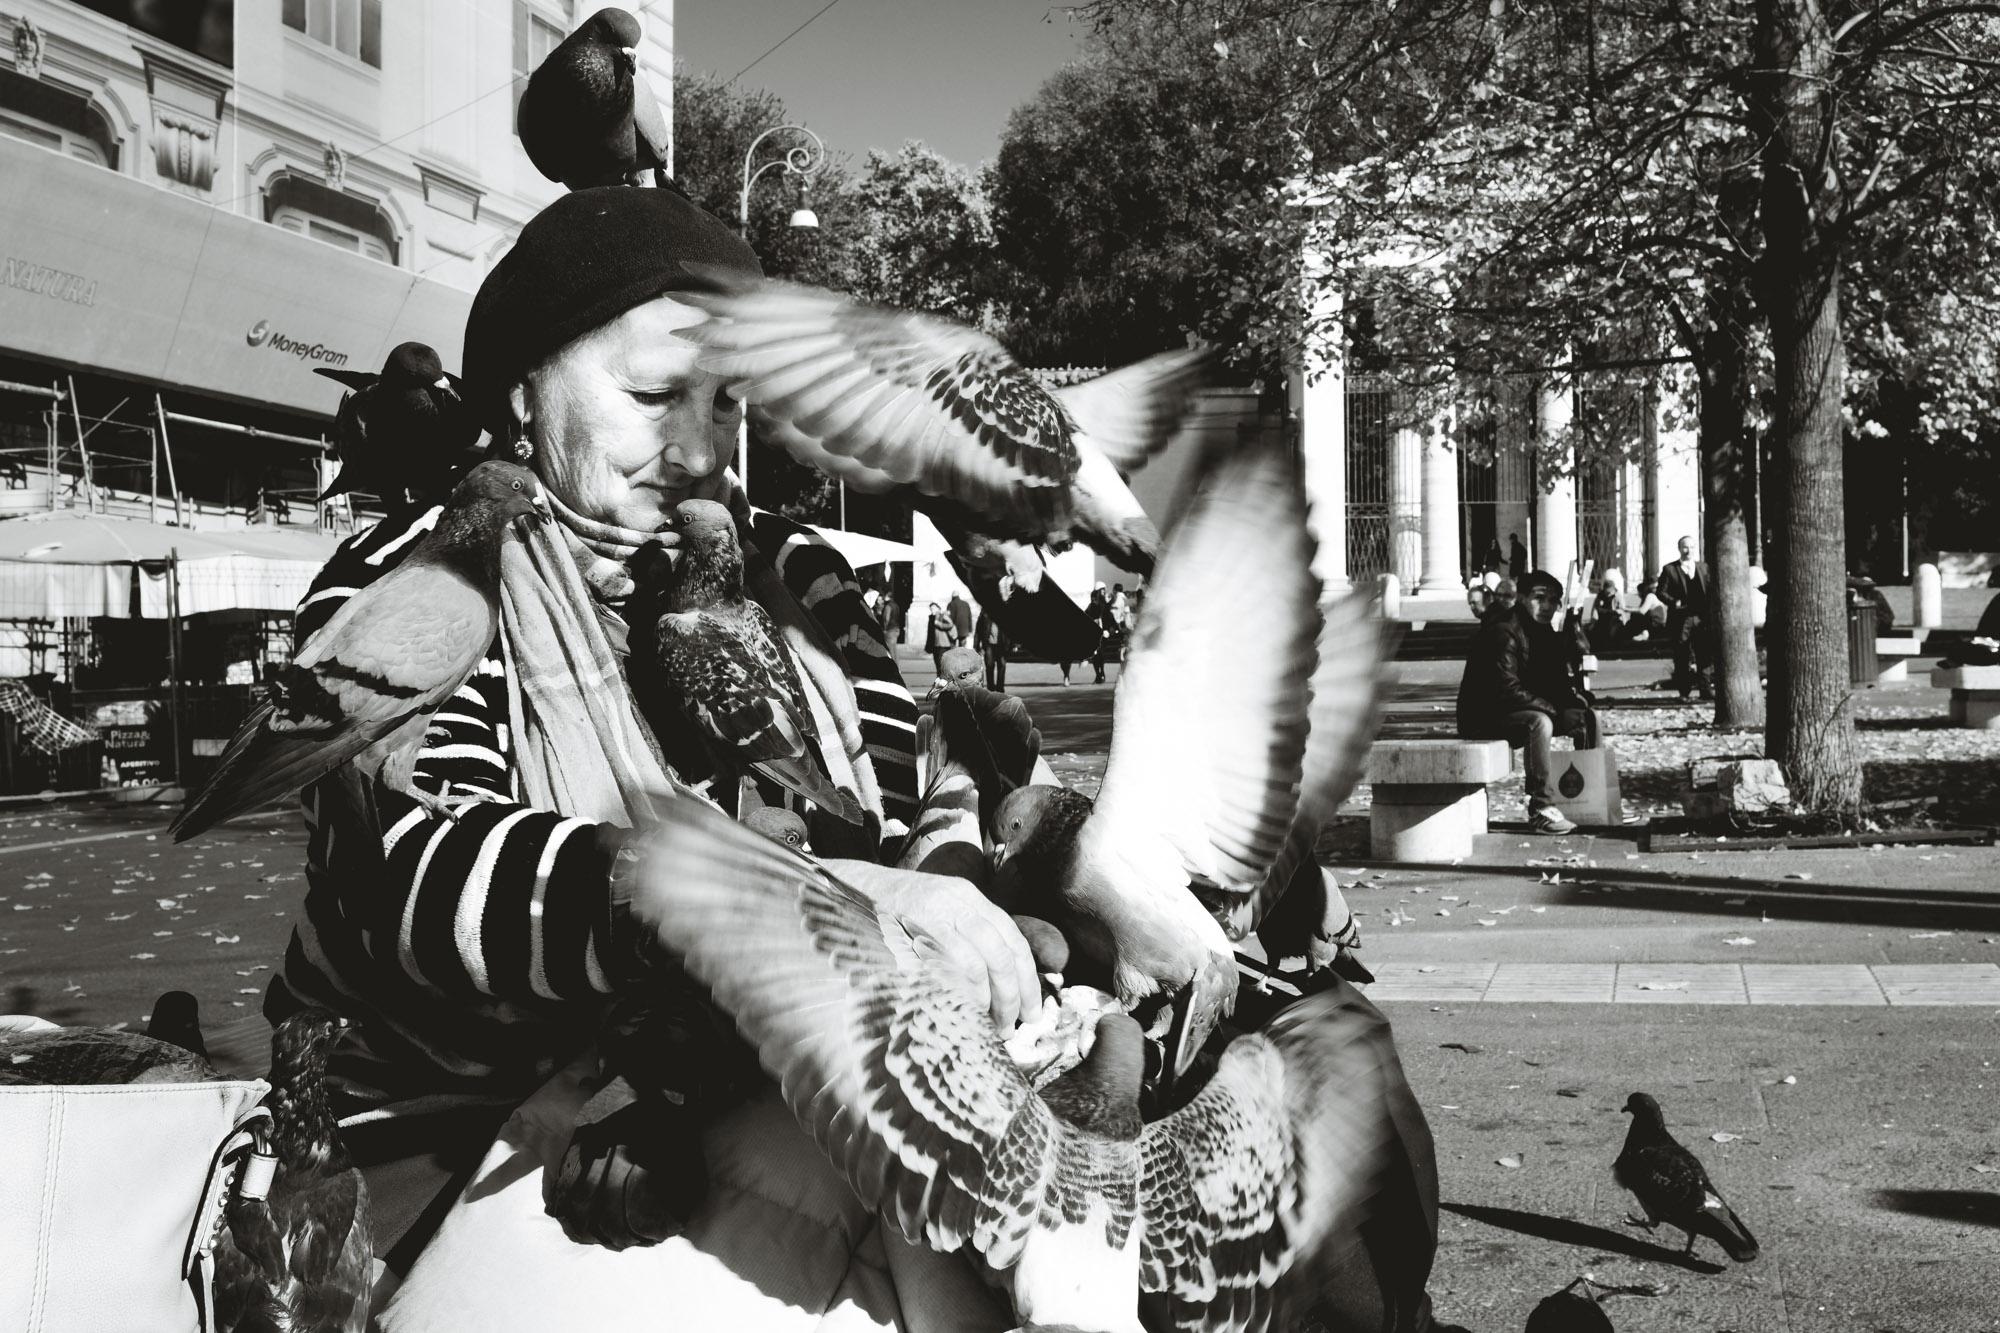 Woamn feeding pigeons while they swarm her